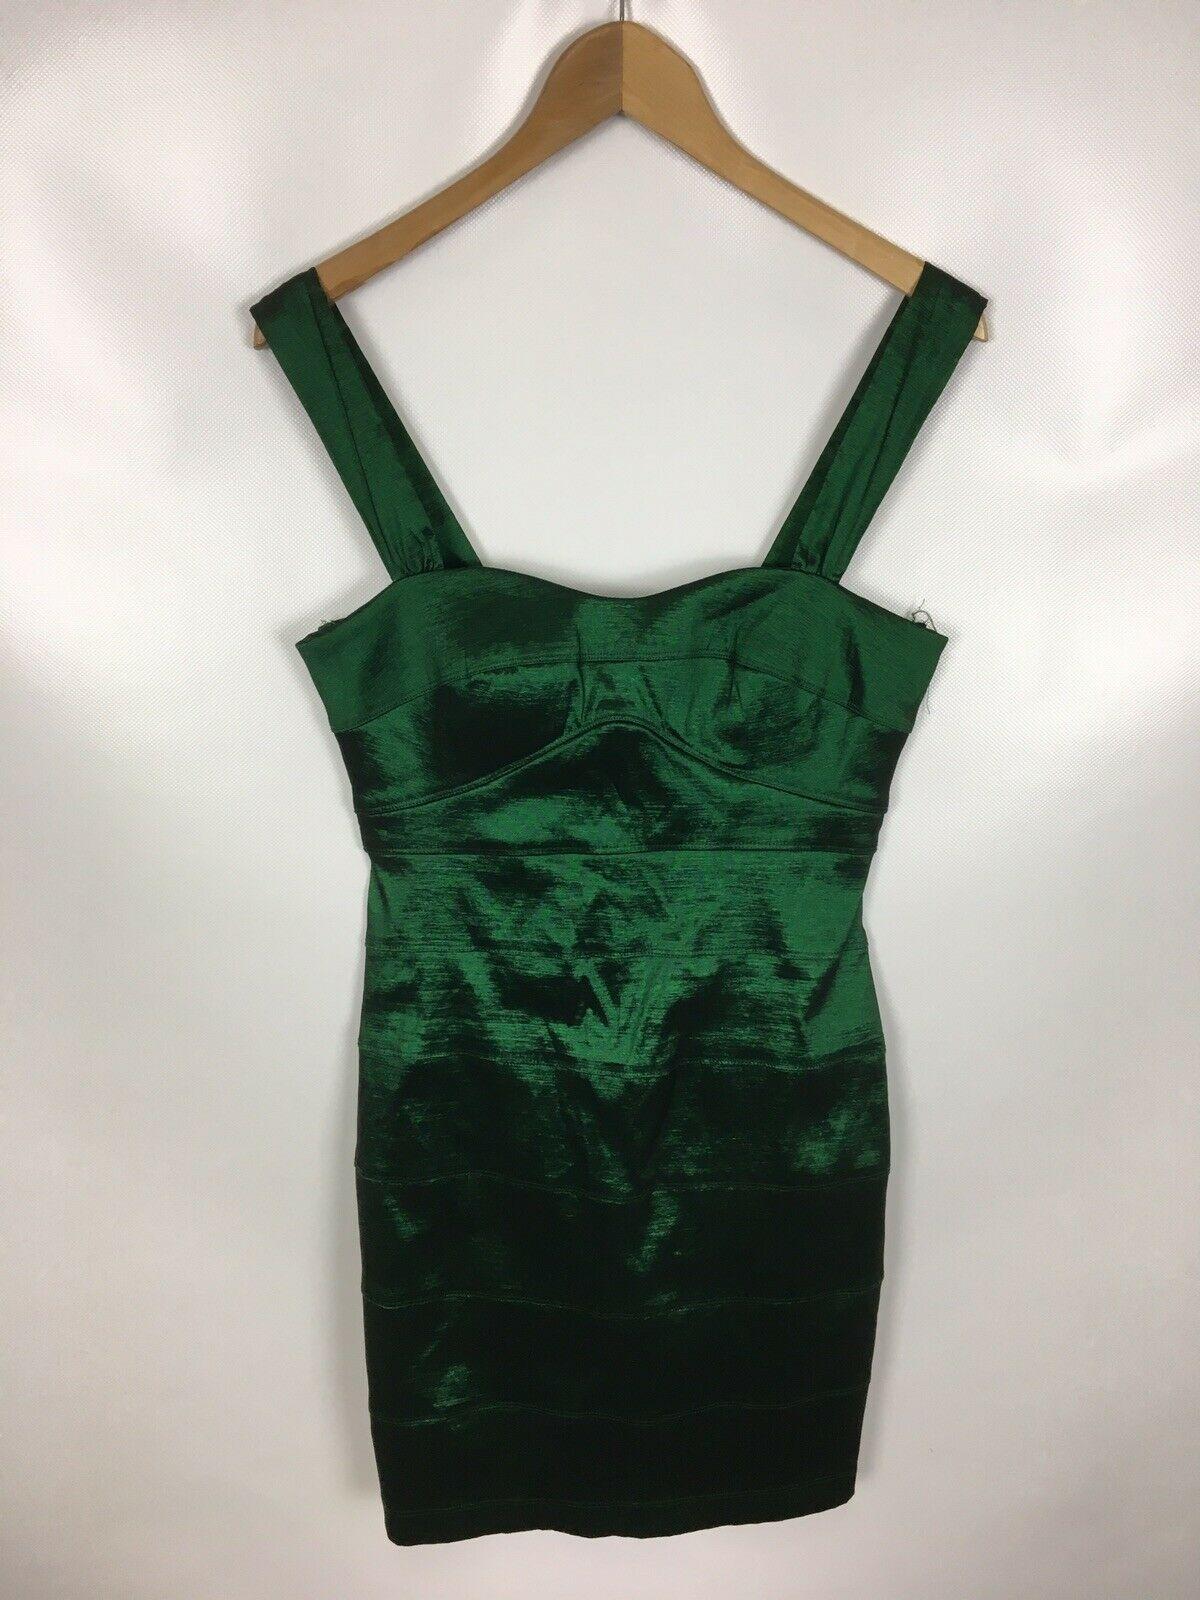 city triangle kleid, grün, größe 7 | ebay in 2020 | grünes